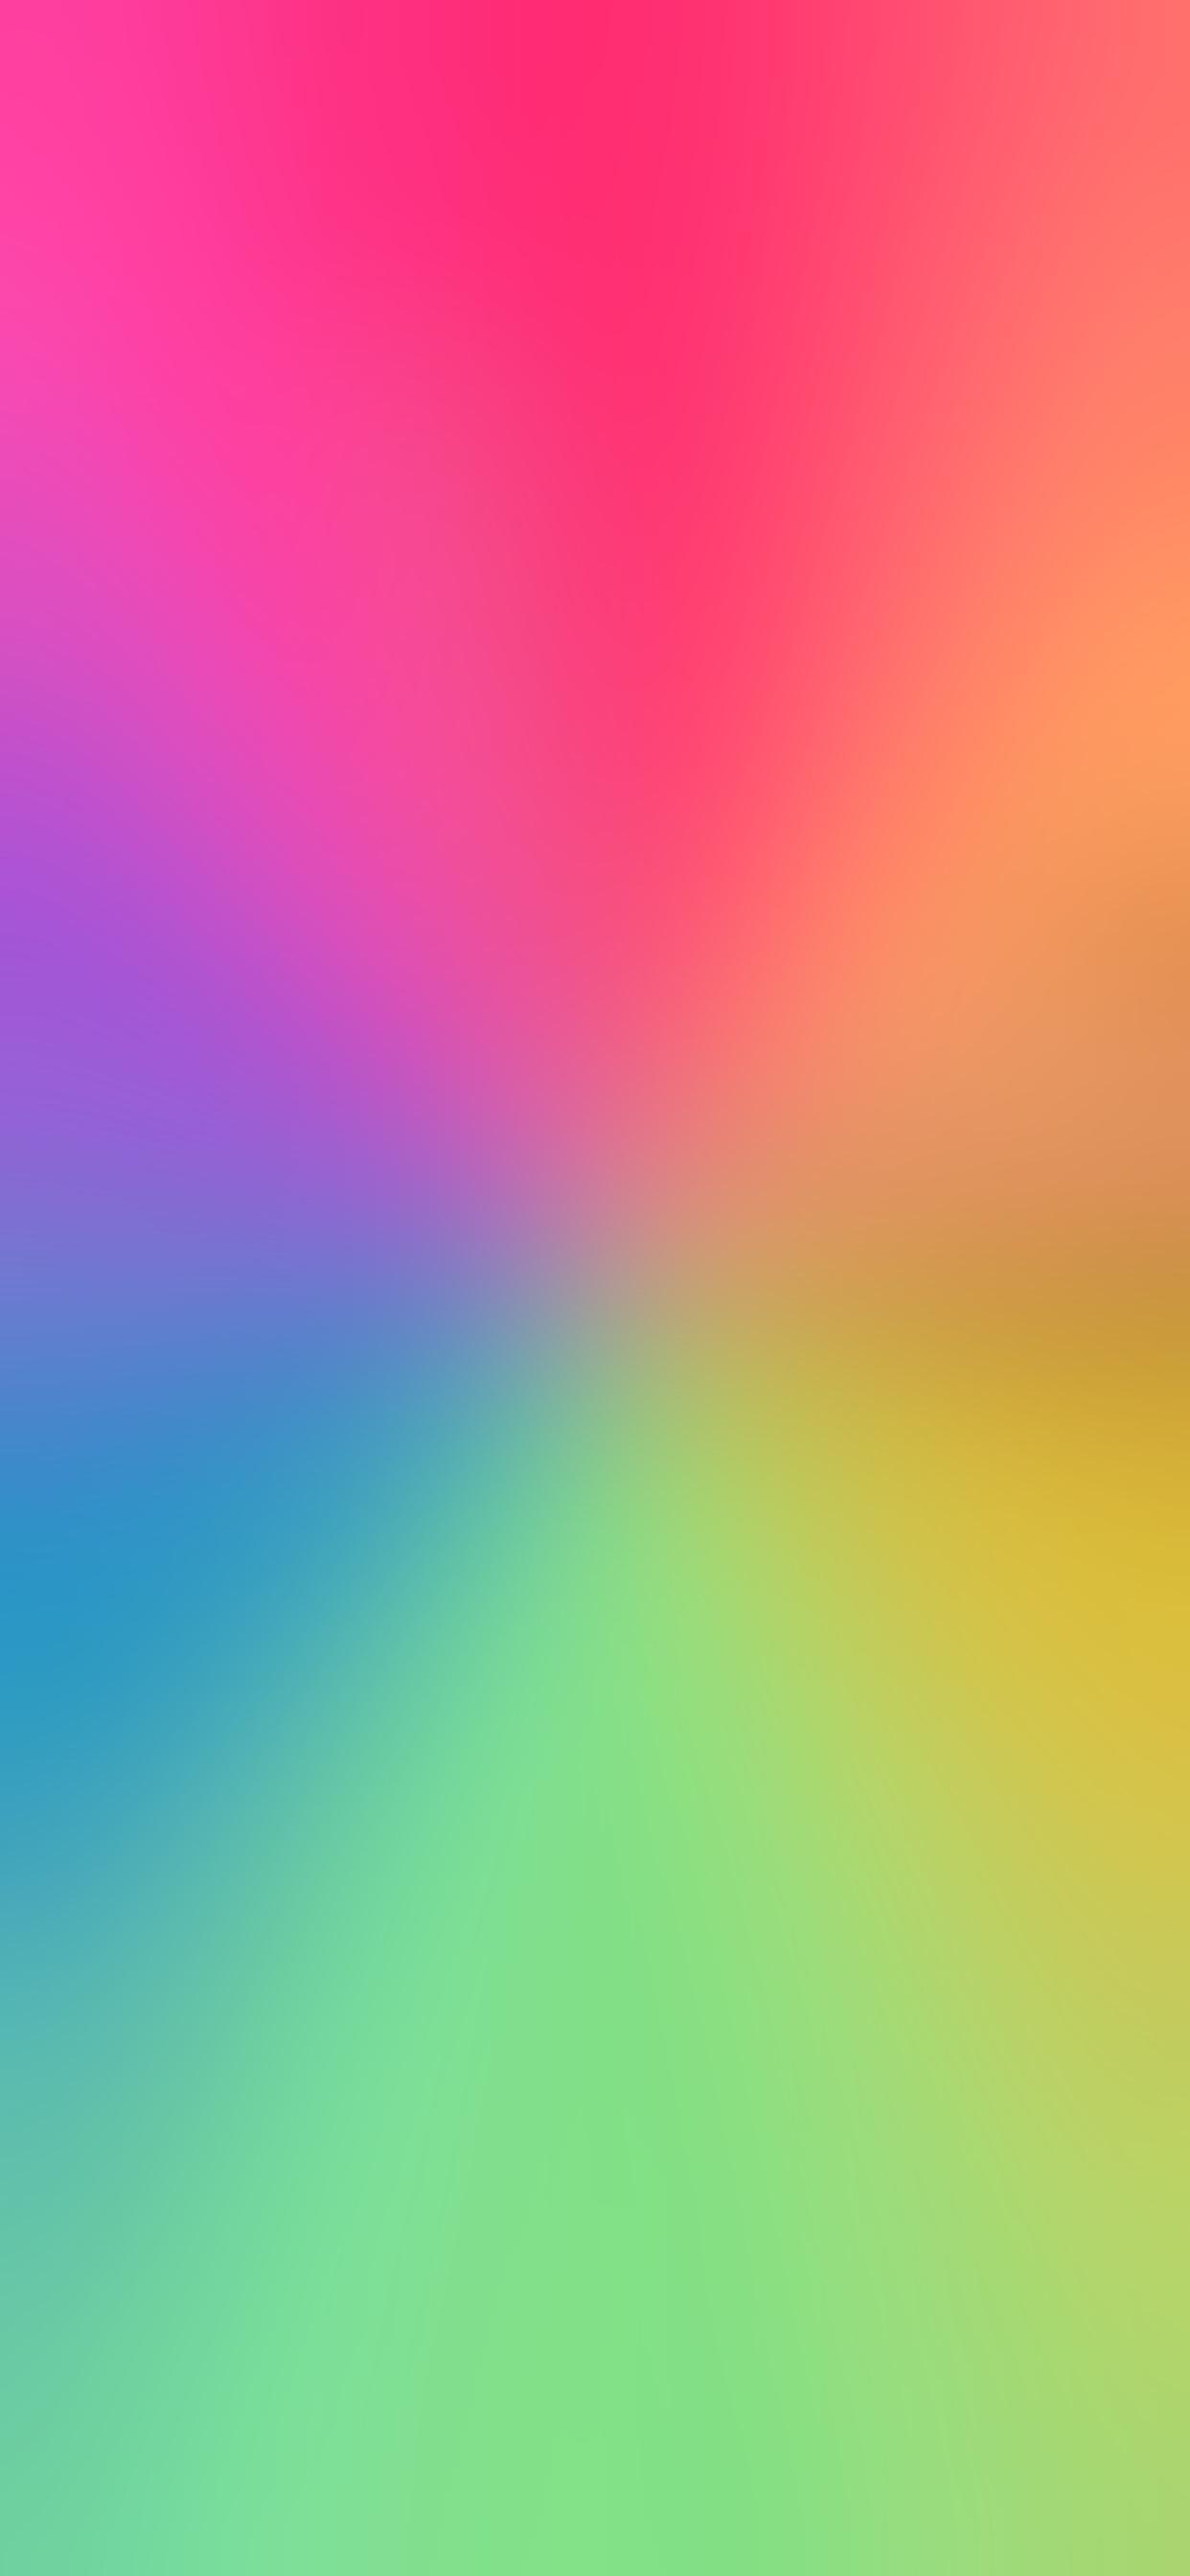 Apple Pride 2020 iPhone wallpapers AR72014 iDownloadBlog